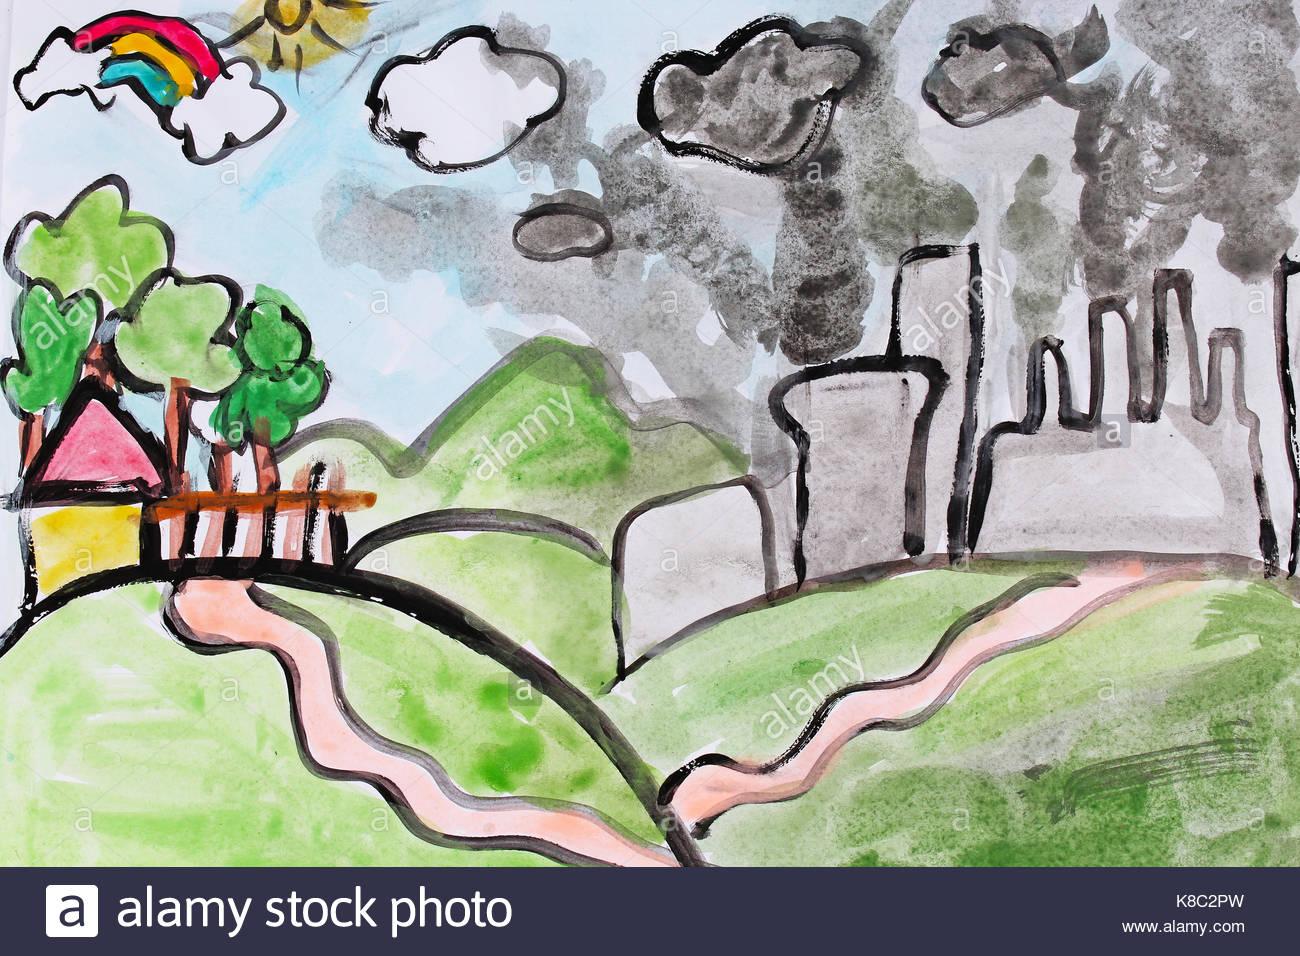 Pollution Drawing at G...